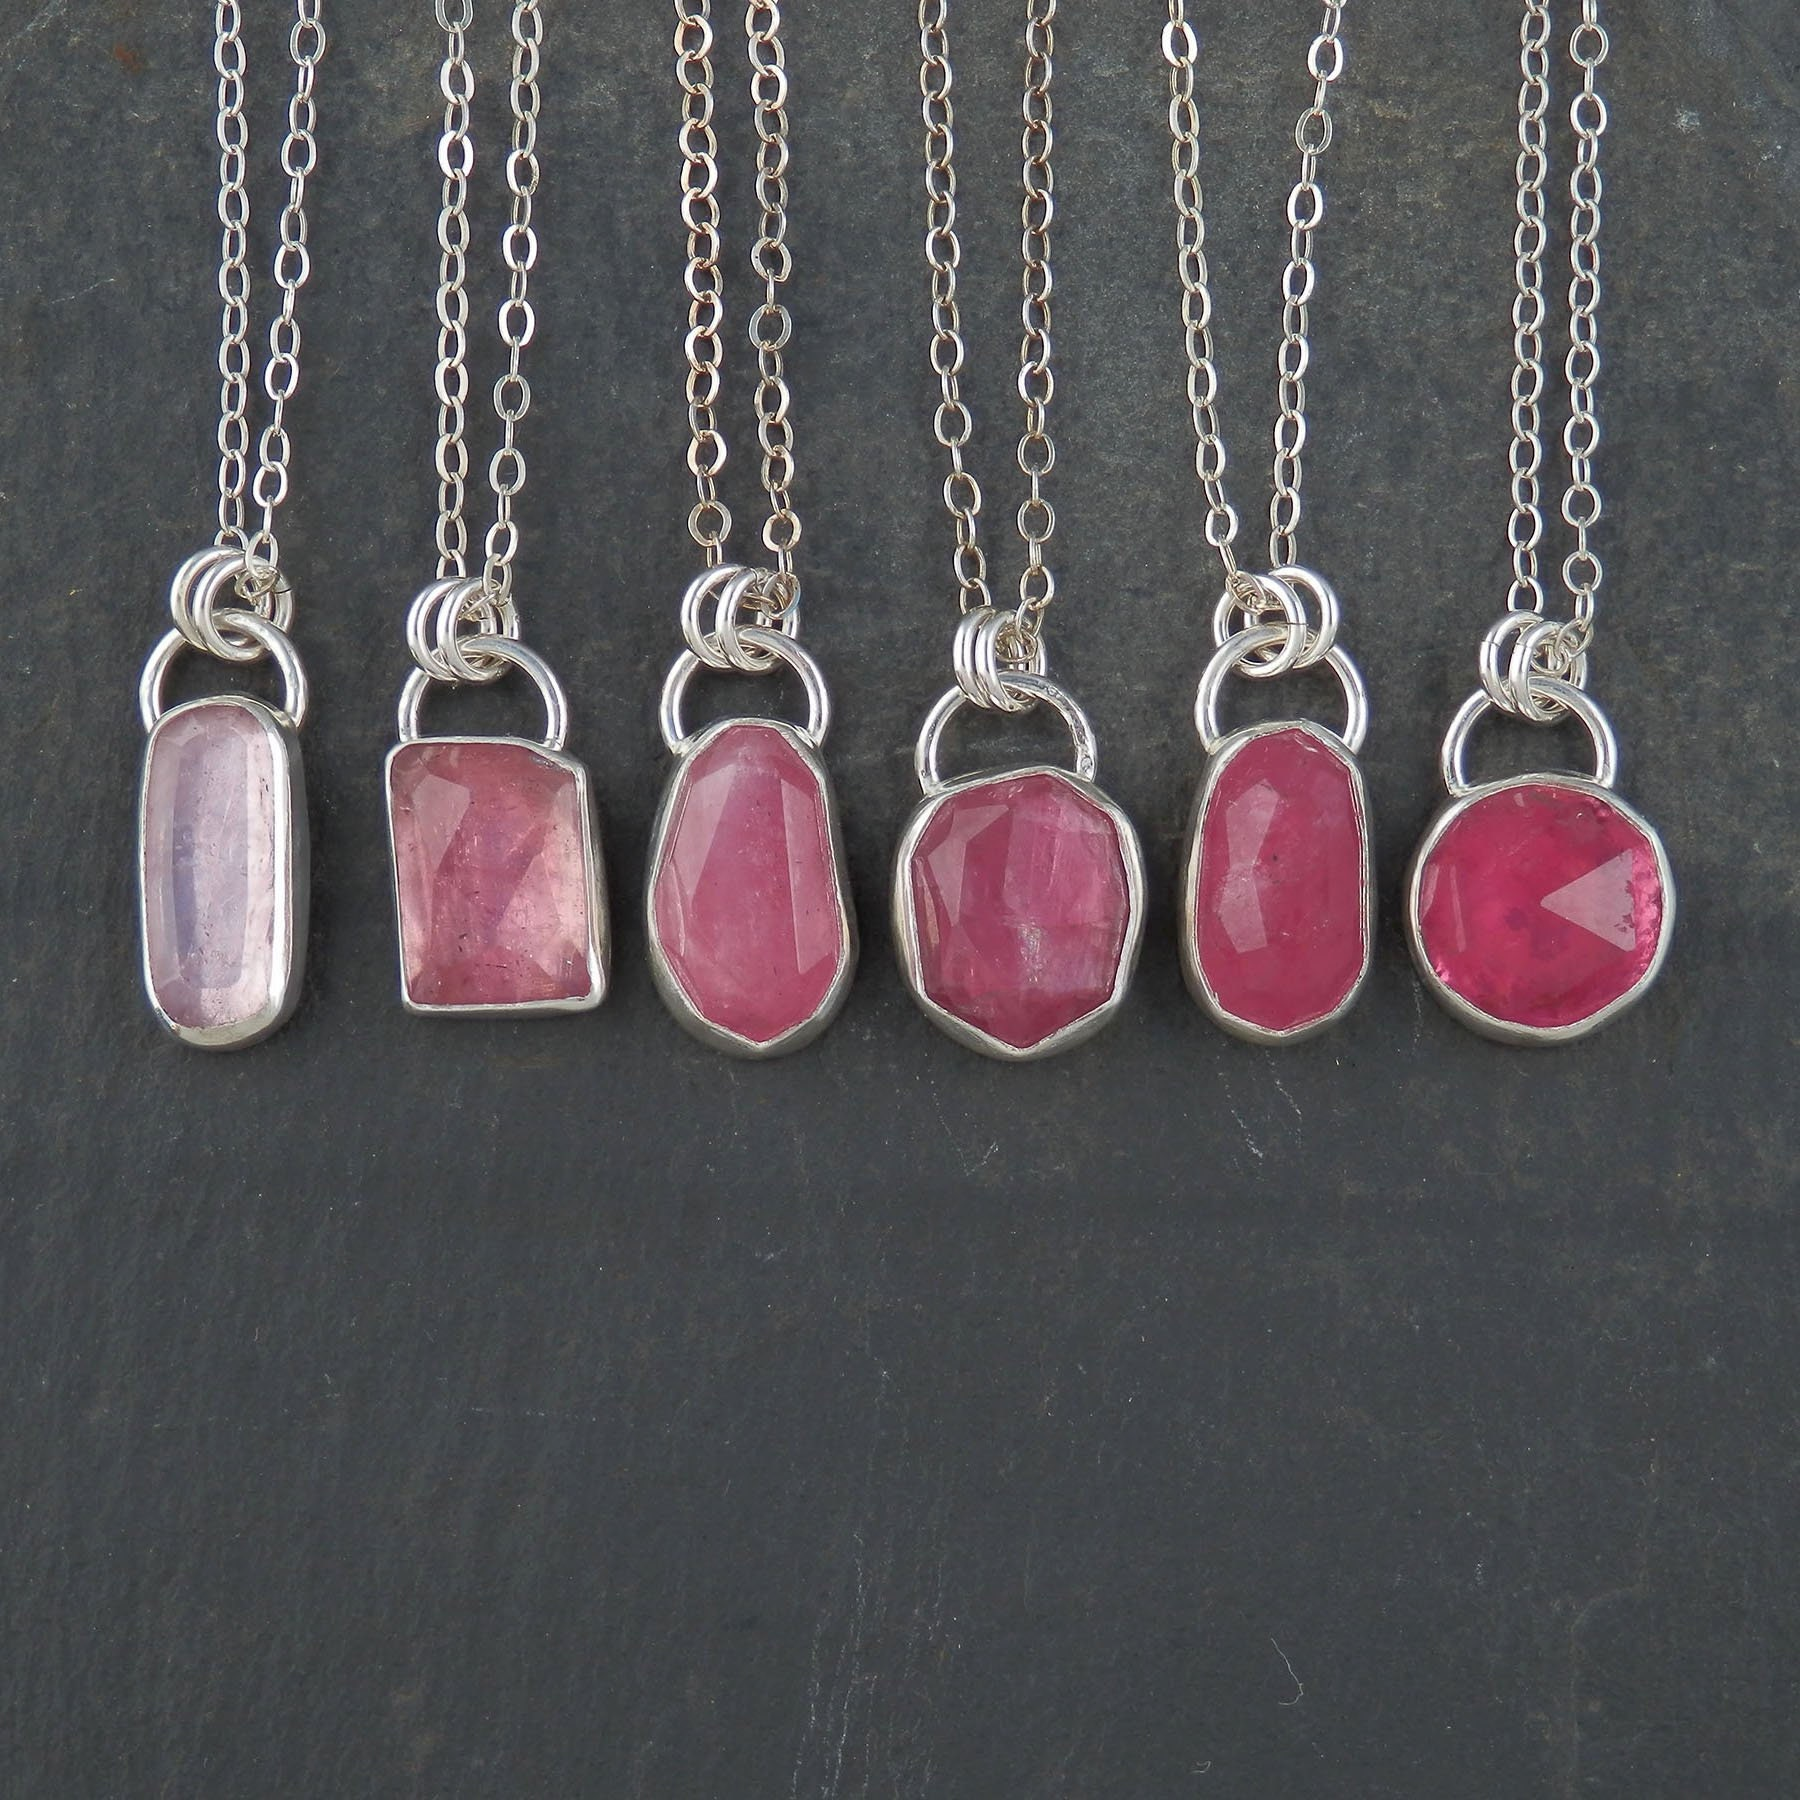 pink tourmaline pendant rose cut tourmaline pink. Black Bedroom Furniture Sets. Home Design Ideas